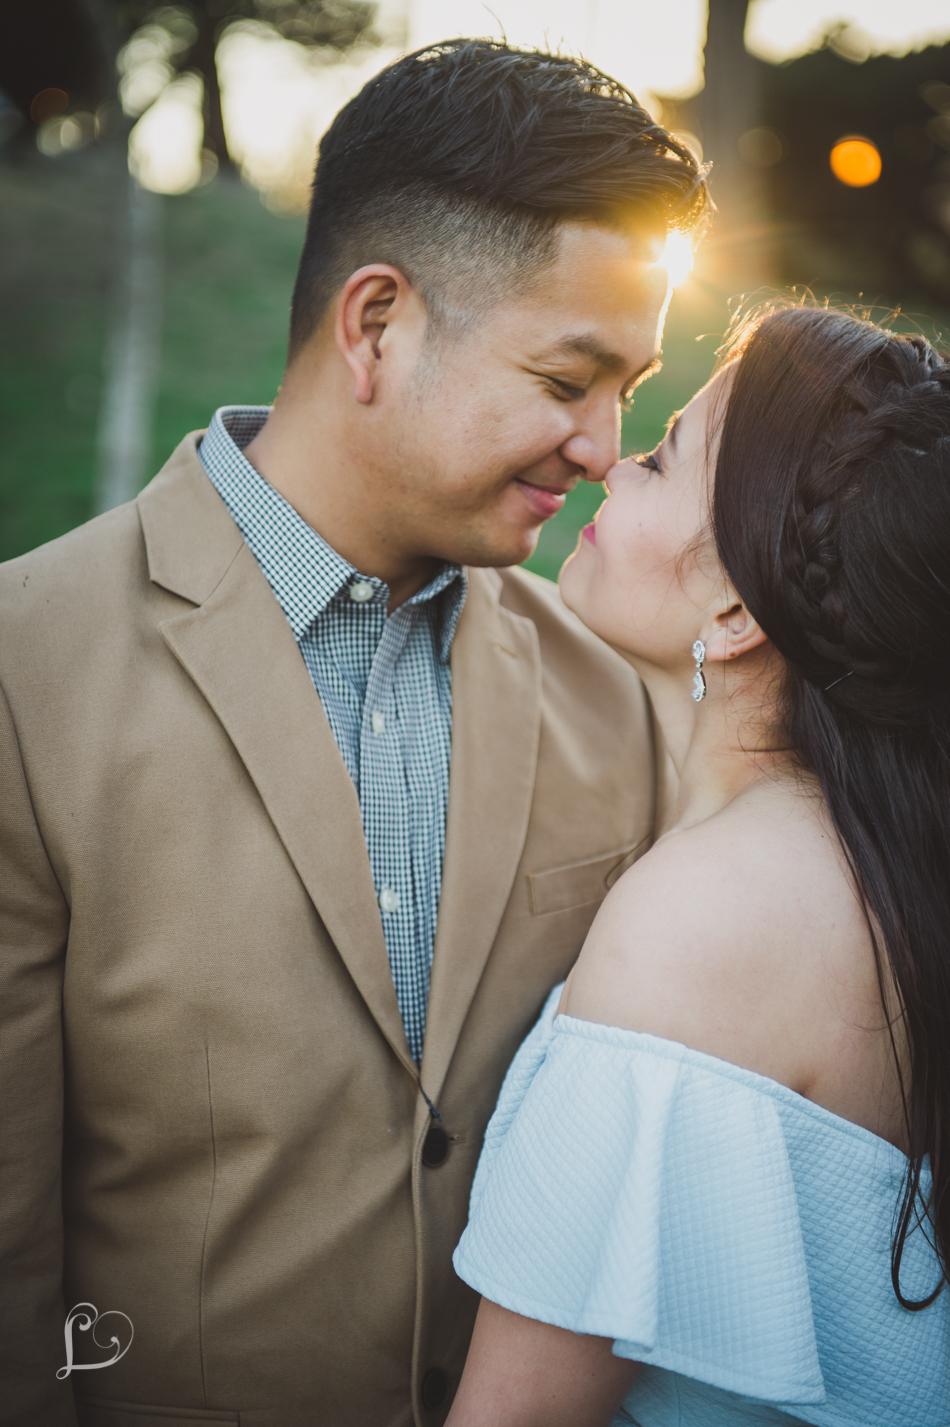 Couple_Portraits_Wedding_Letlove_Photography-2